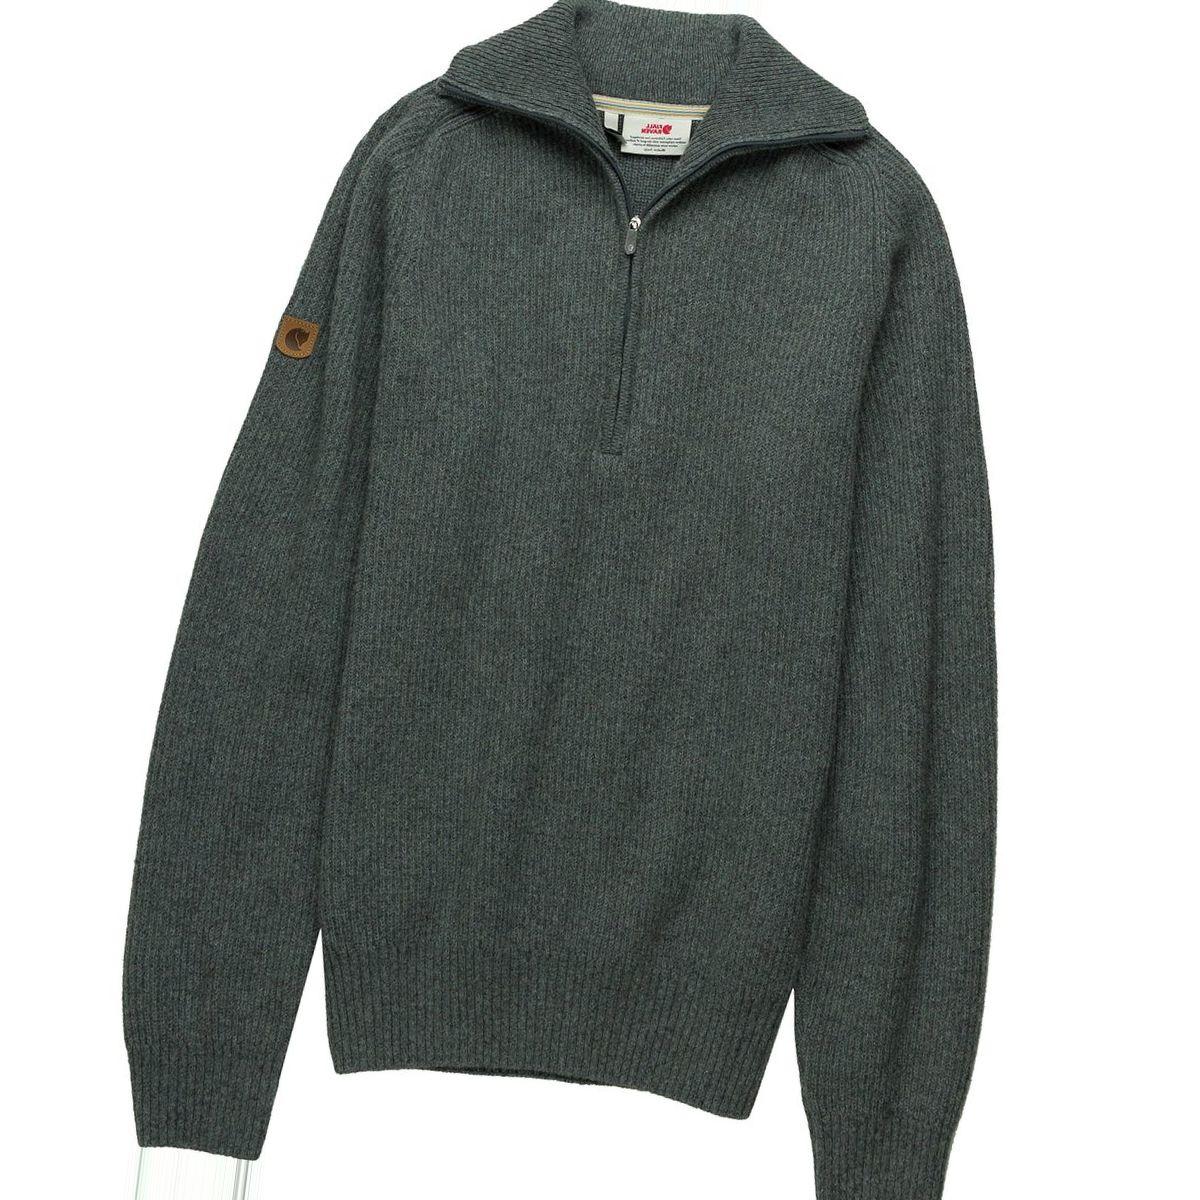 Fjallraven Greenland Re-Wool Sweater - Men's